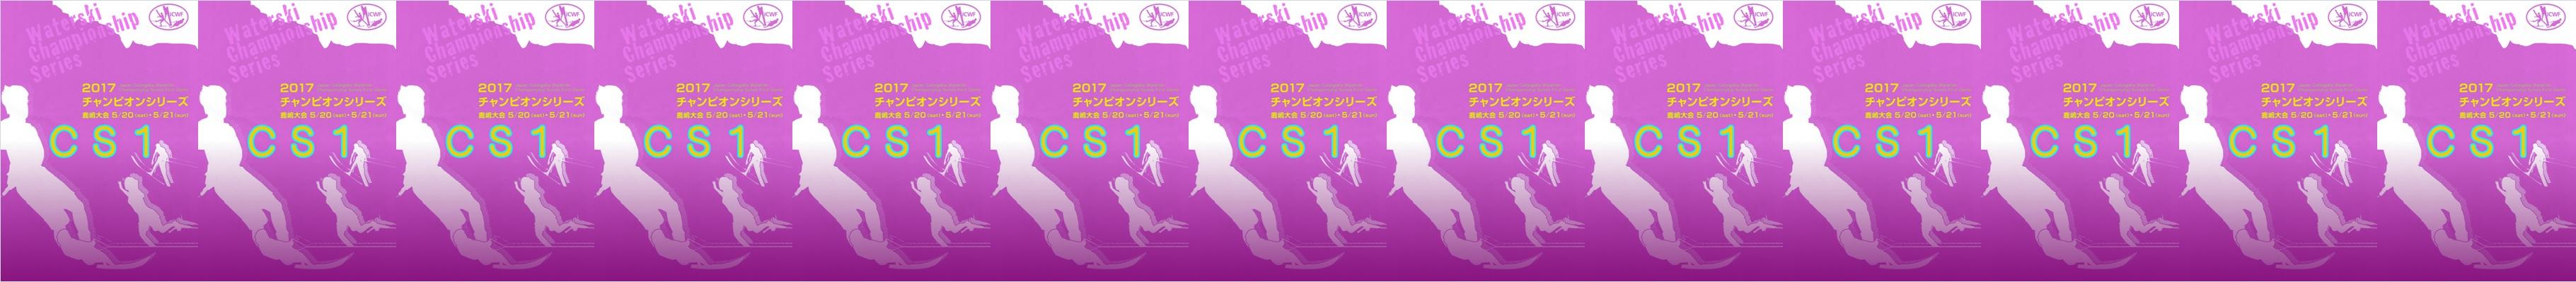 2017CS1 Women's Title_001